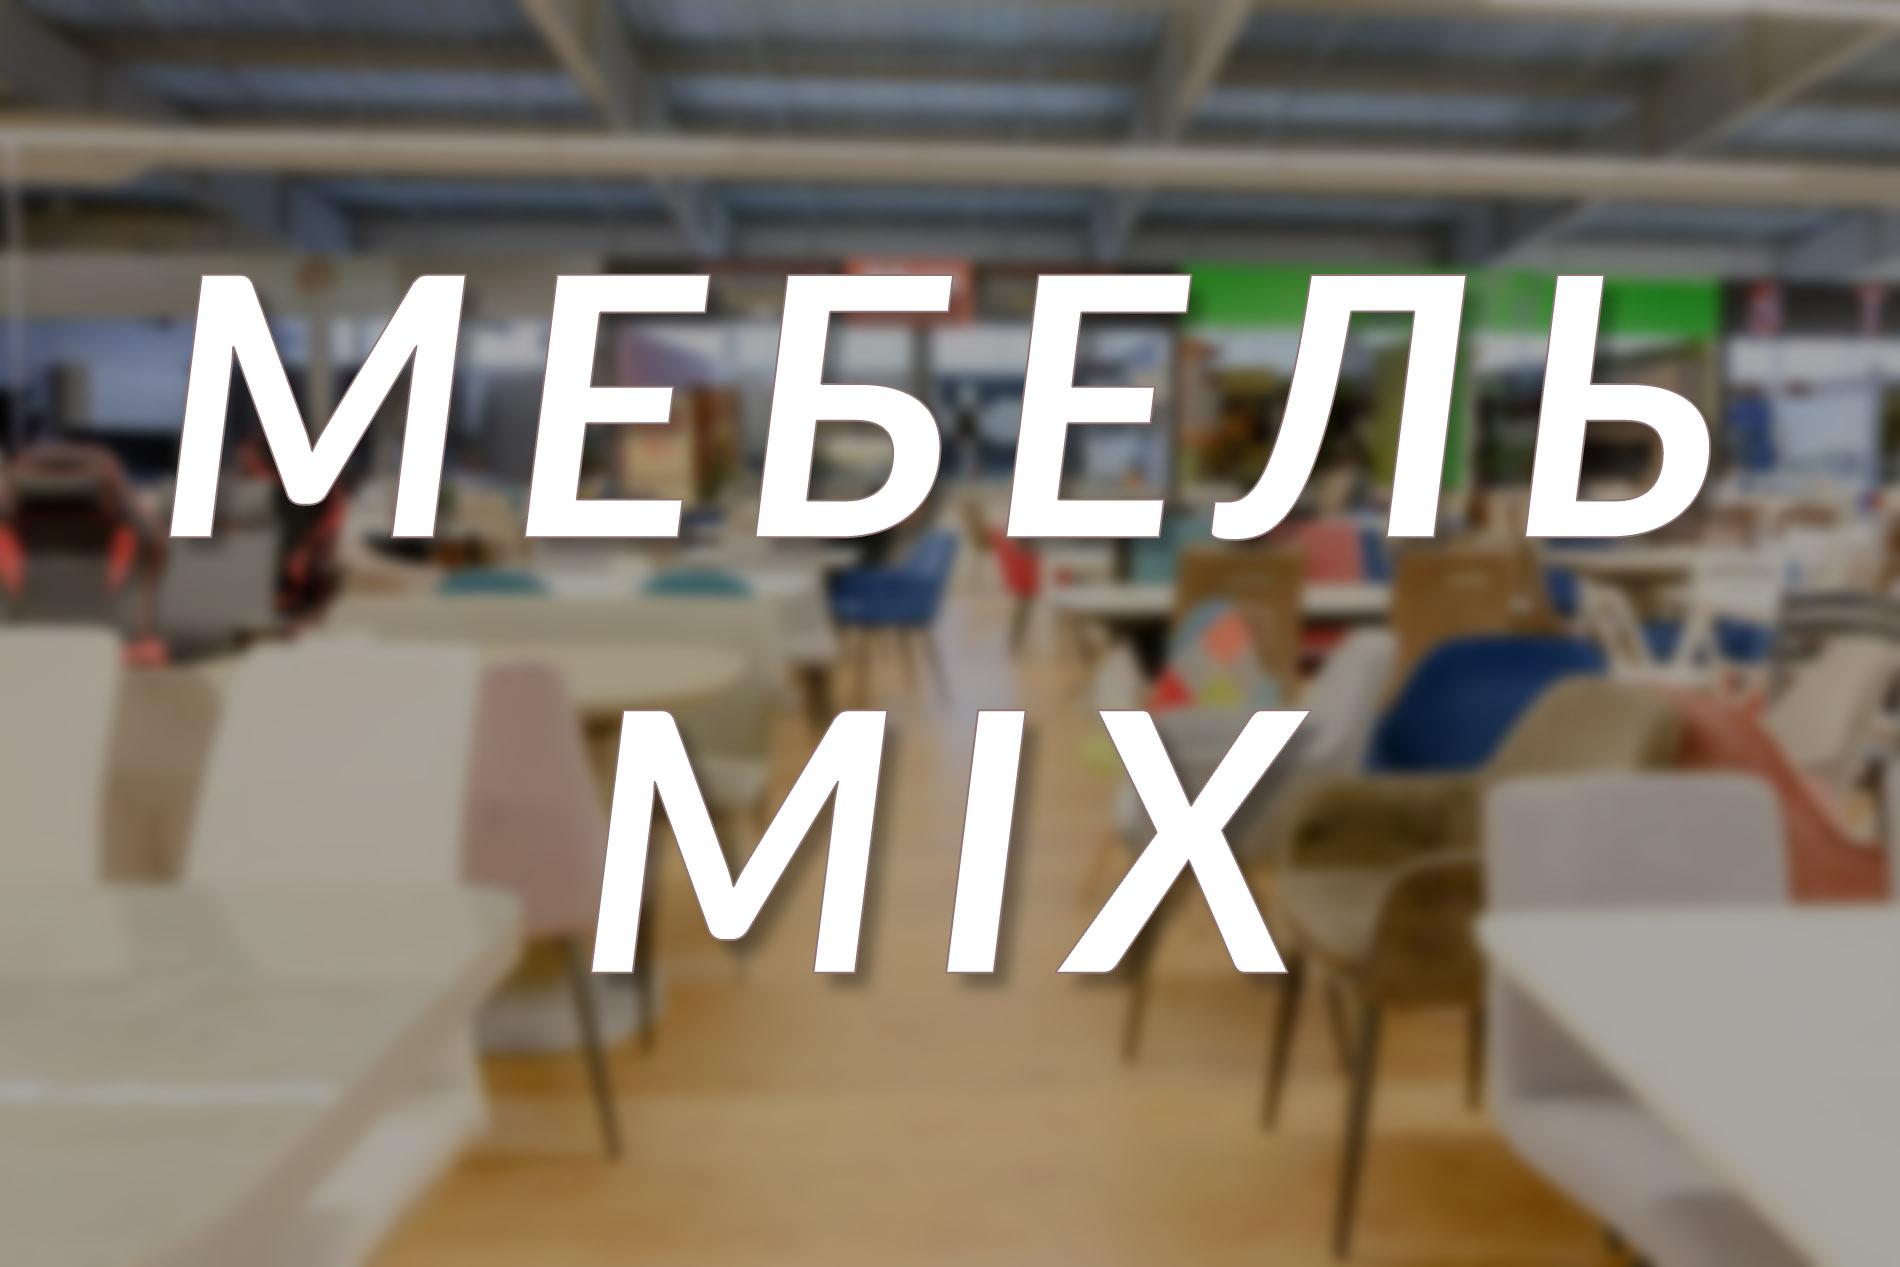 Мебель Mix